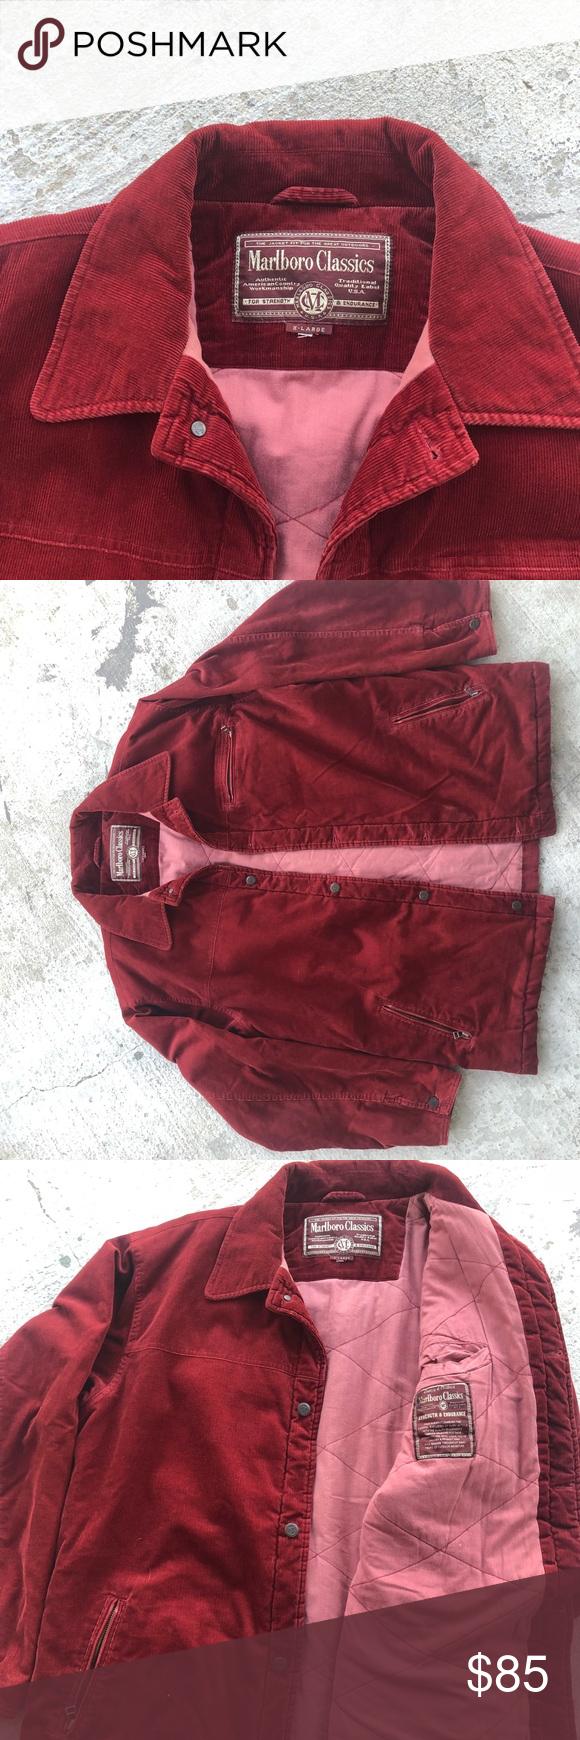 Vintage Men S Marlboro Classics Corduroy Jacket Corduroy Jacket Vintage Men Classic Jacket